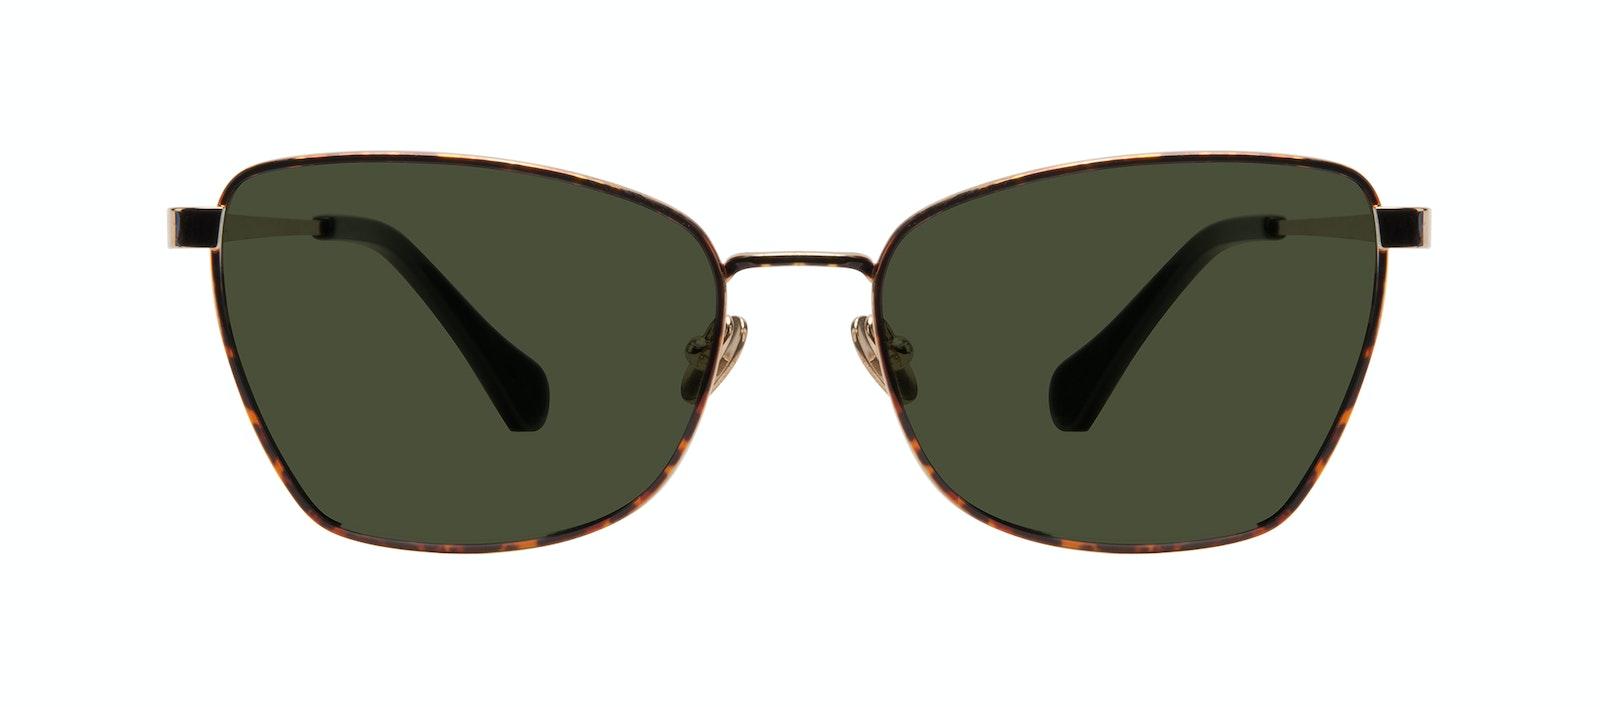 Affordable Fashion Glasses Cat Eye Sunglasses Women Fancy Gold Tort Front